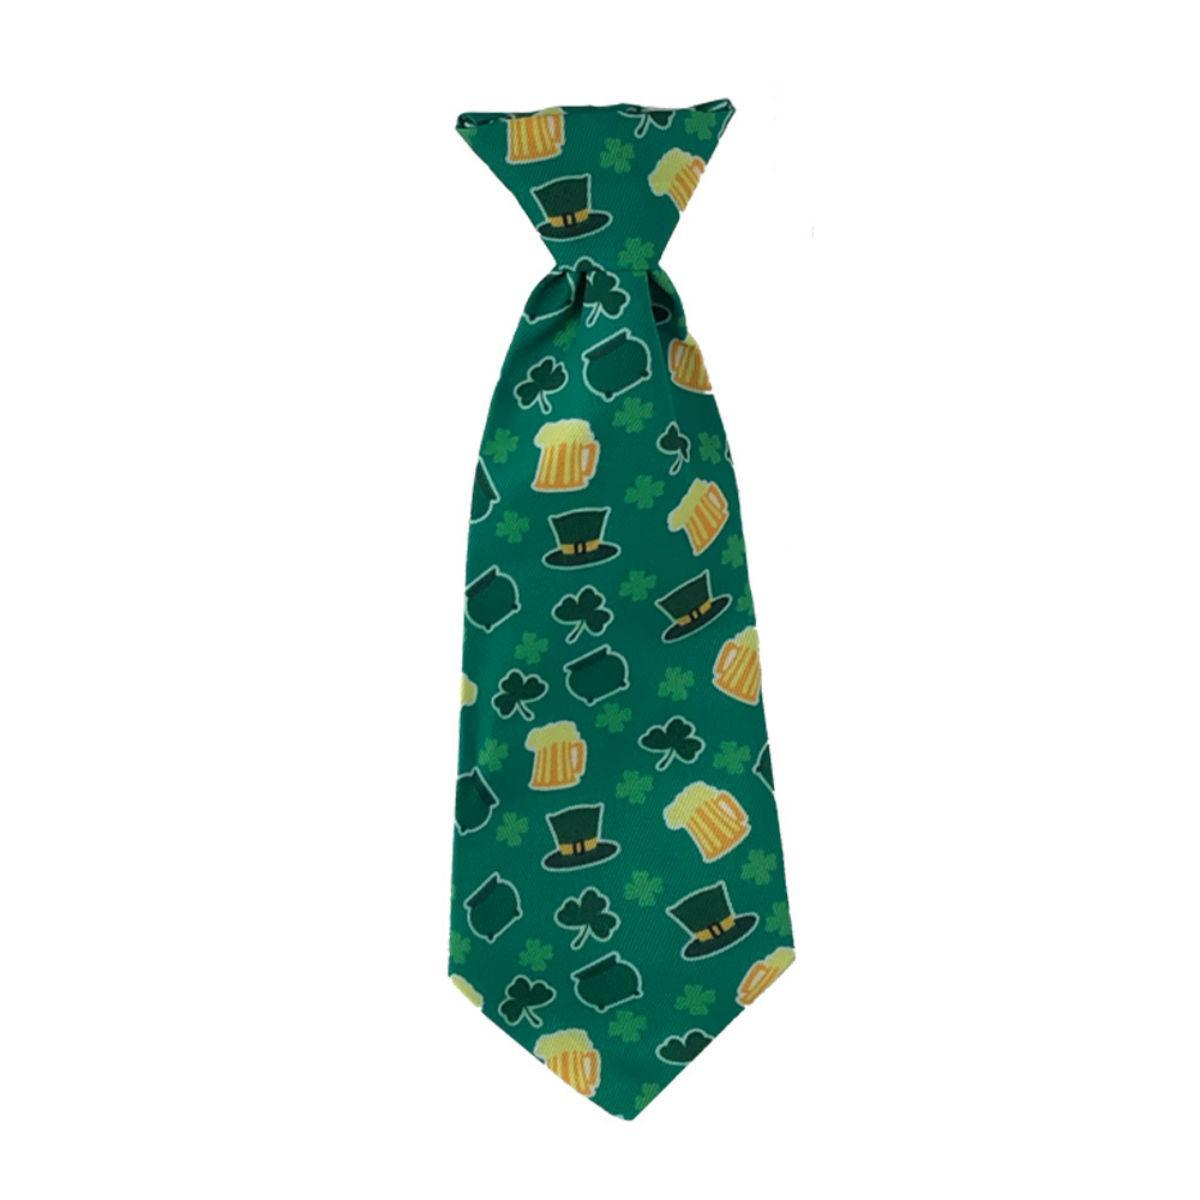 Huxley & Kent Long Tie Collar Attachment Dog Necktie - Pot O Gold